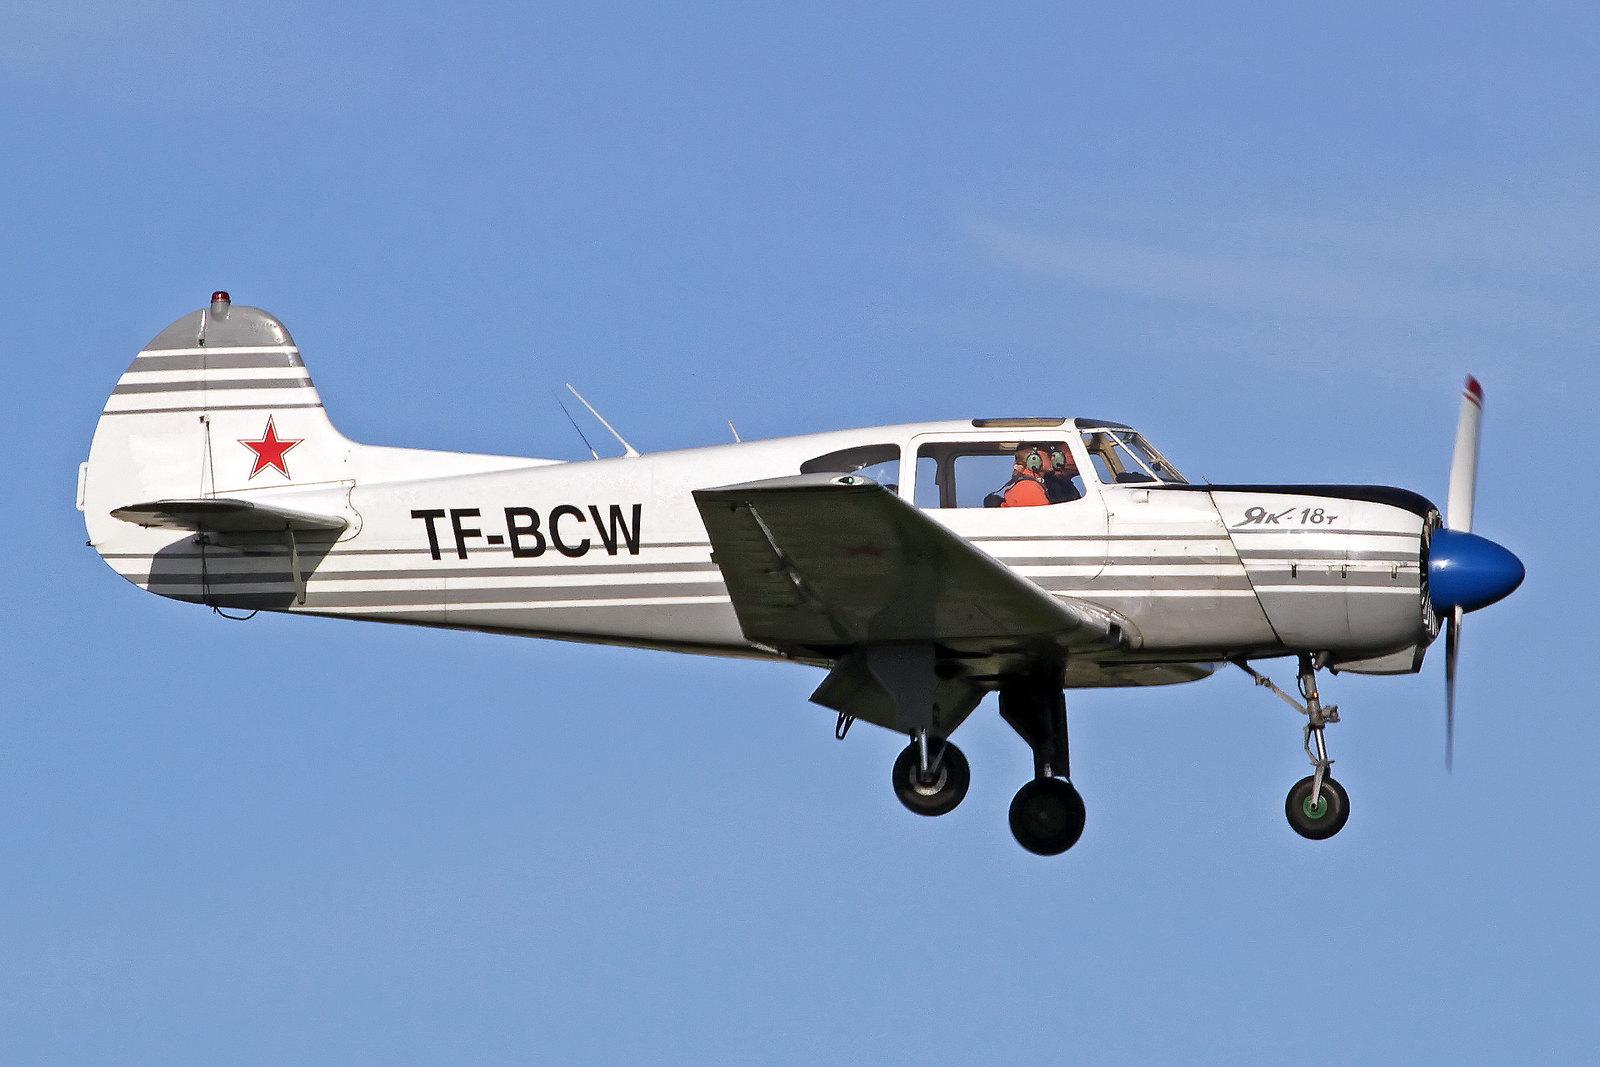 Flugklúbbur Alþýðu Yakovlev Yak-18T TF-BCW, RKV, 14. August 2020